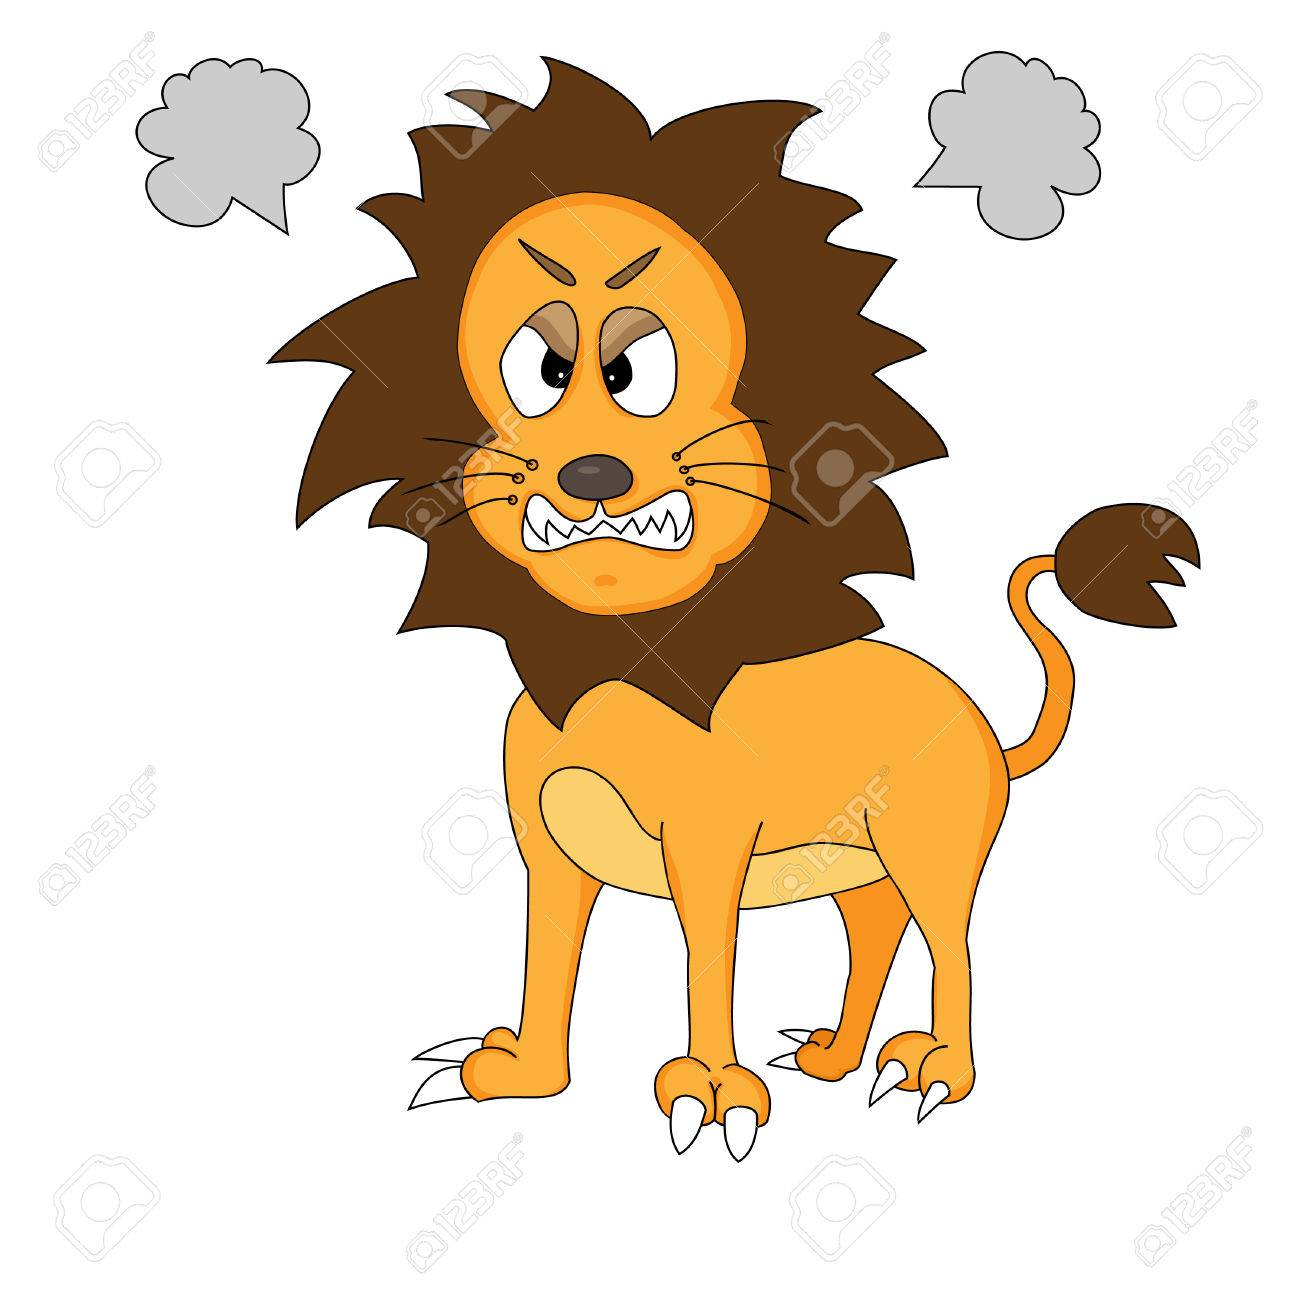 Angry Cute Cartoon Lion Stock Vector - 4348601